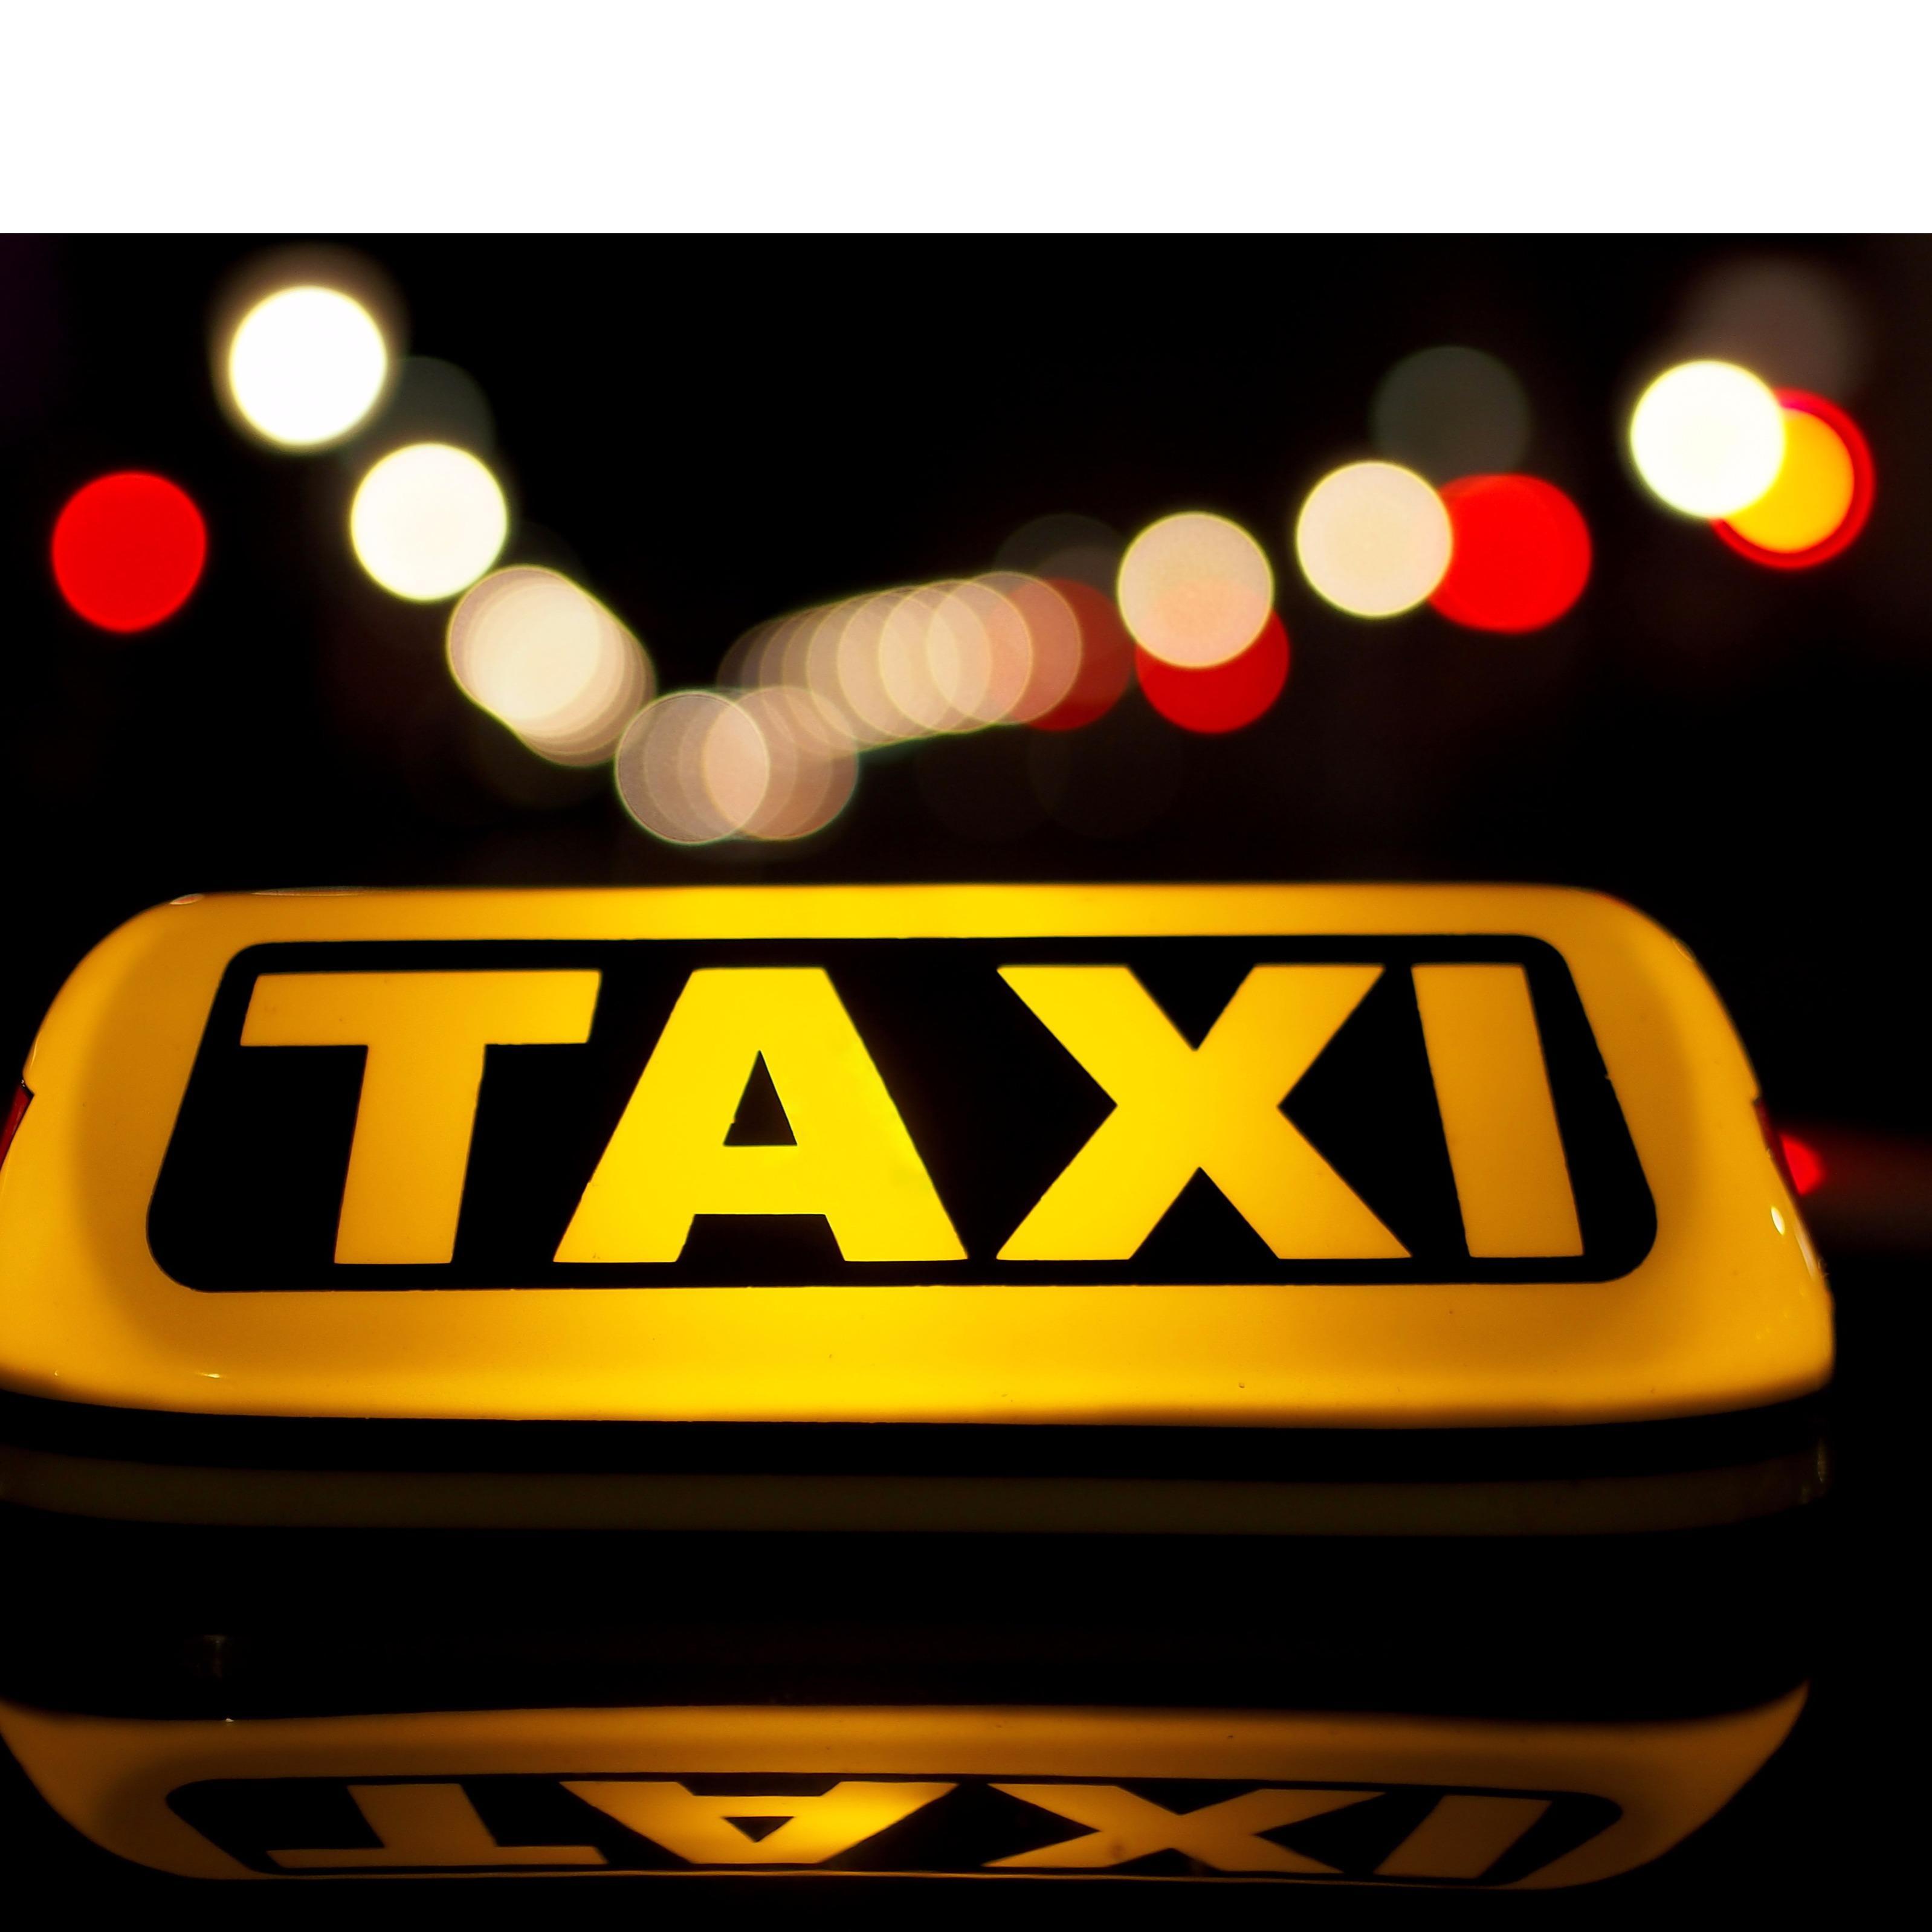 Five Star Taxi Cab